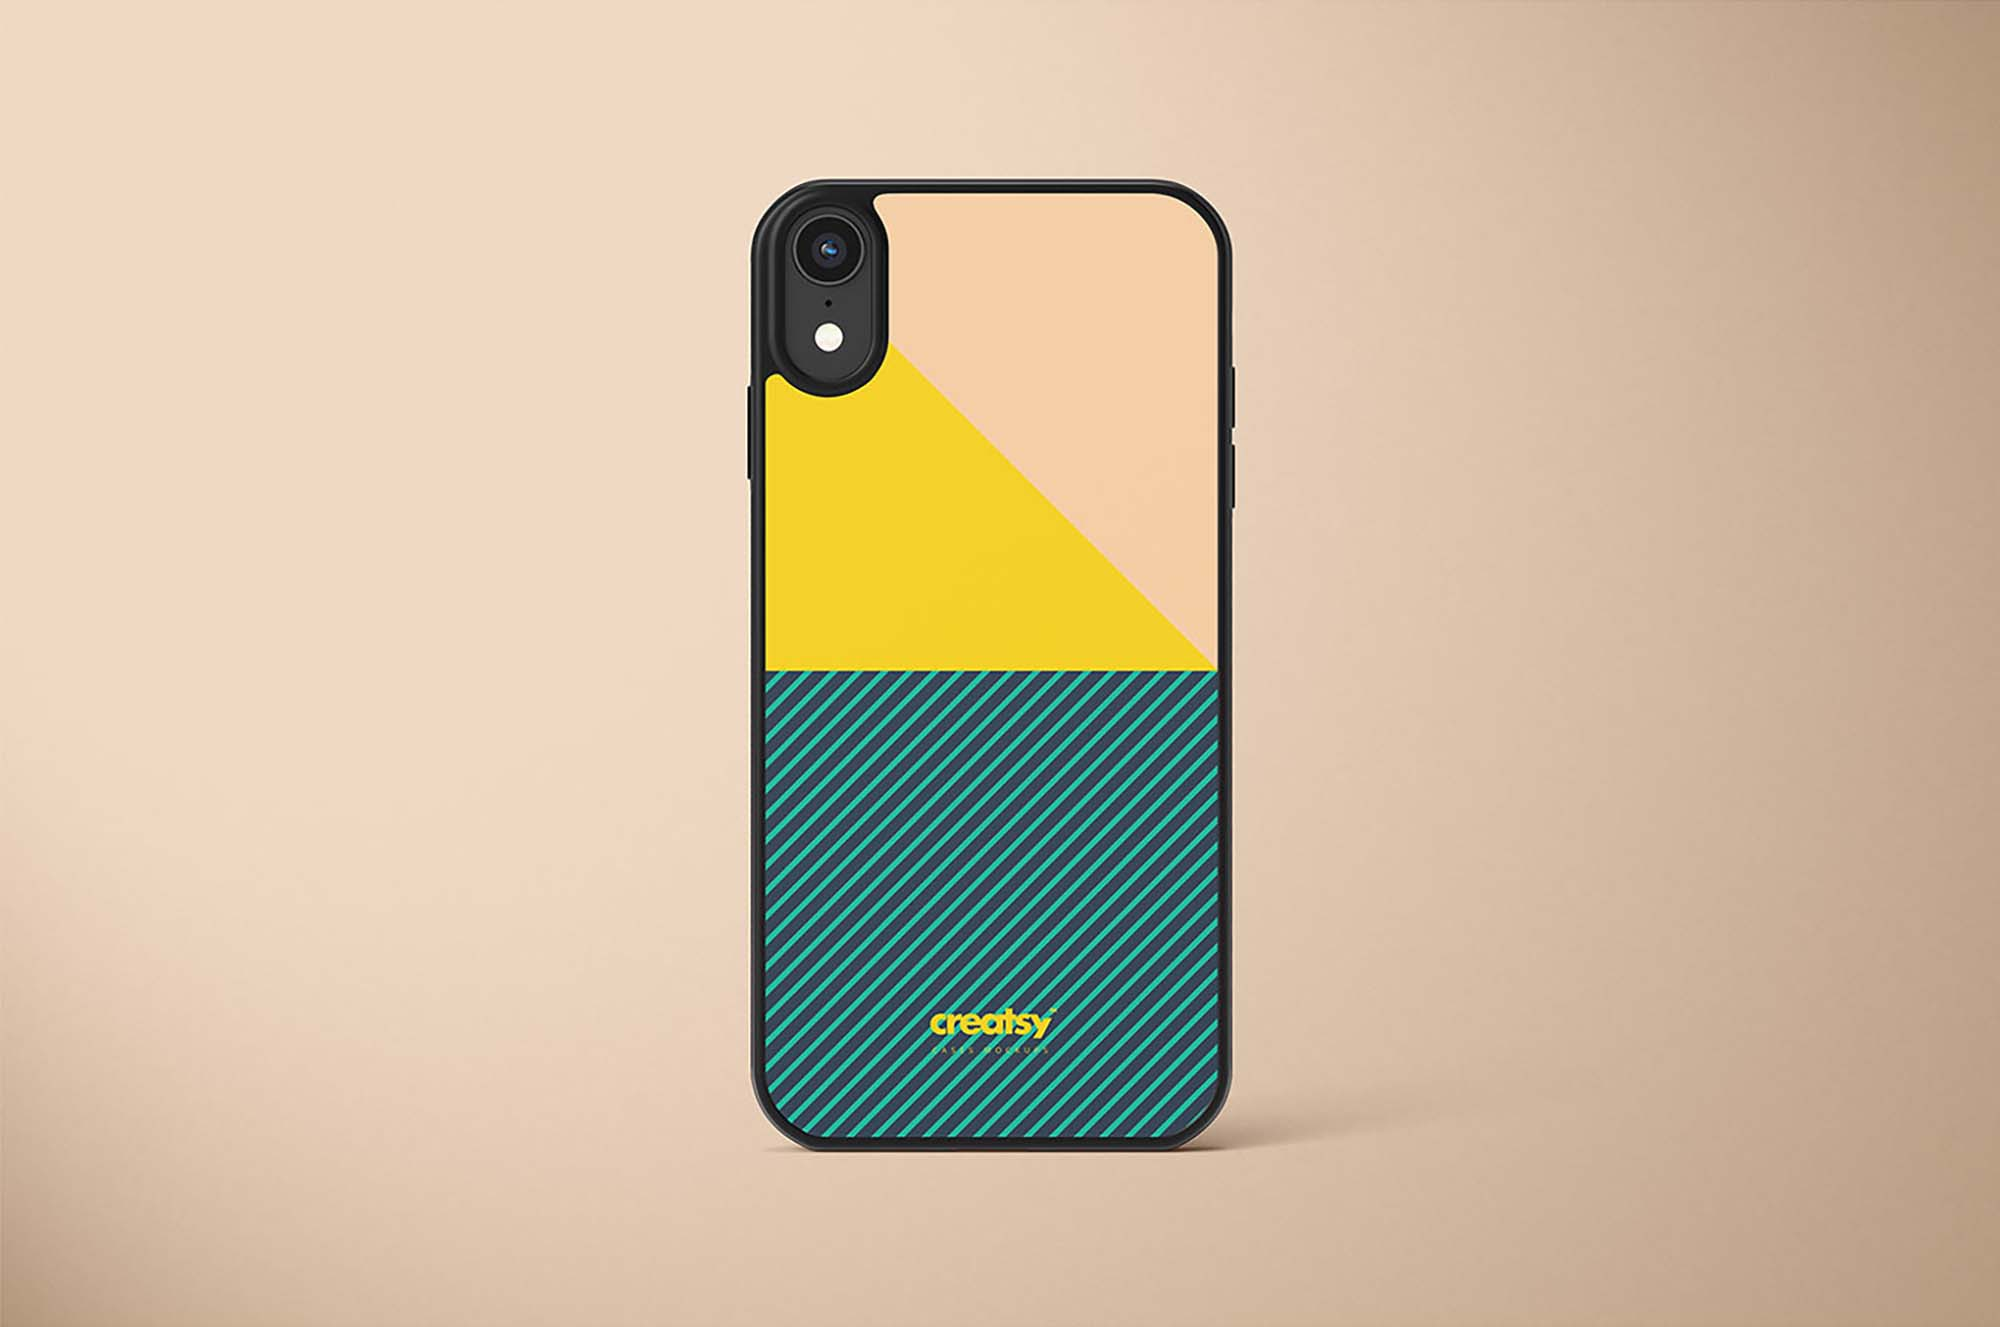 iPhone XR Case Mockup 2